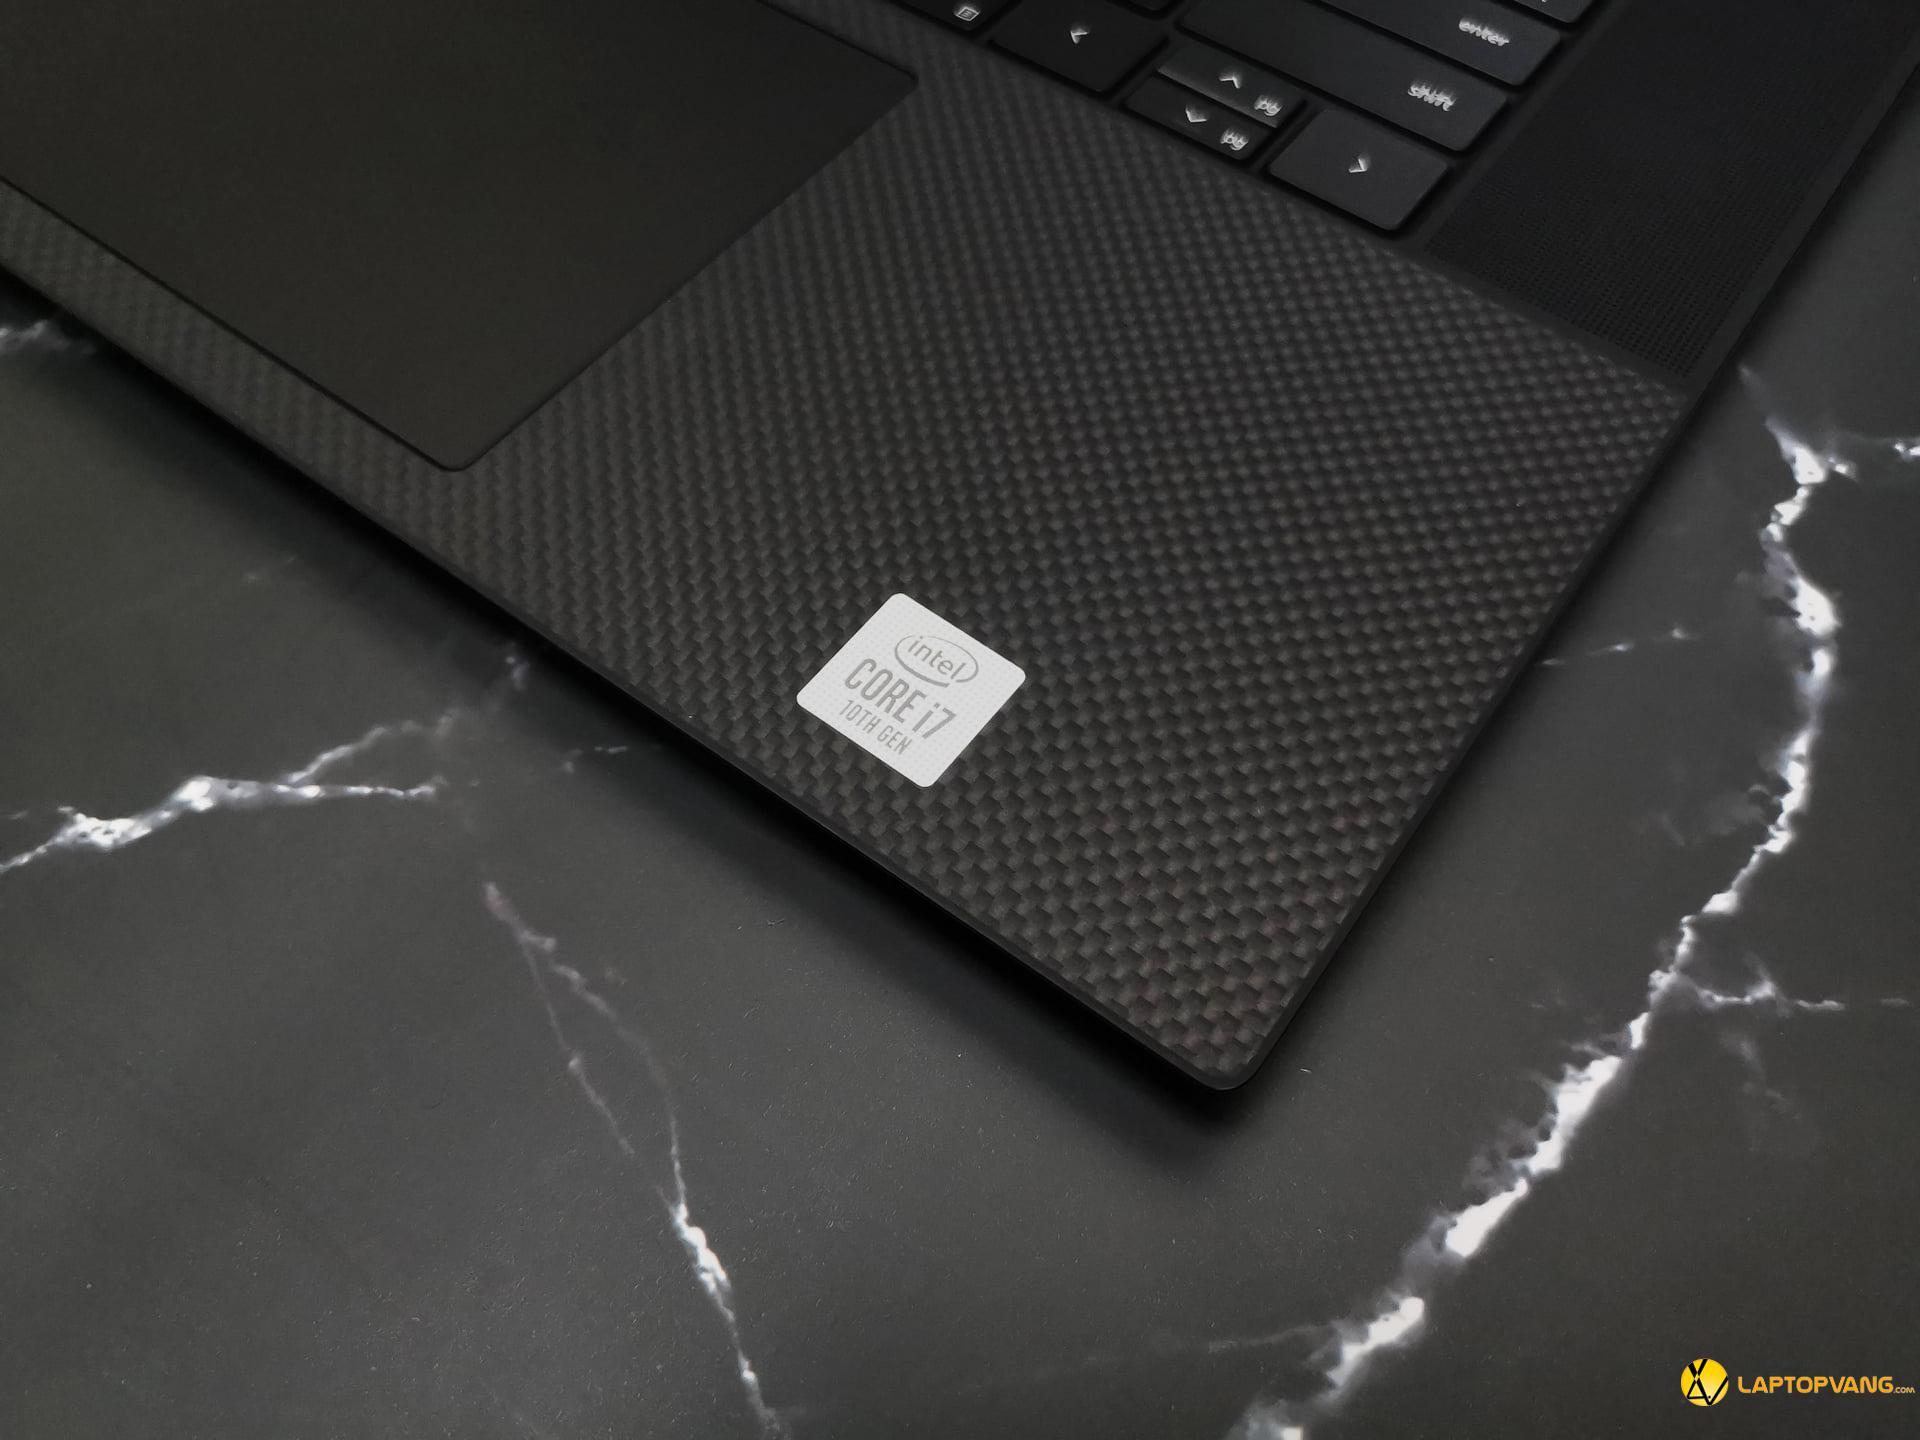 dell_precision_5750_2020_performance_laptopvang.com